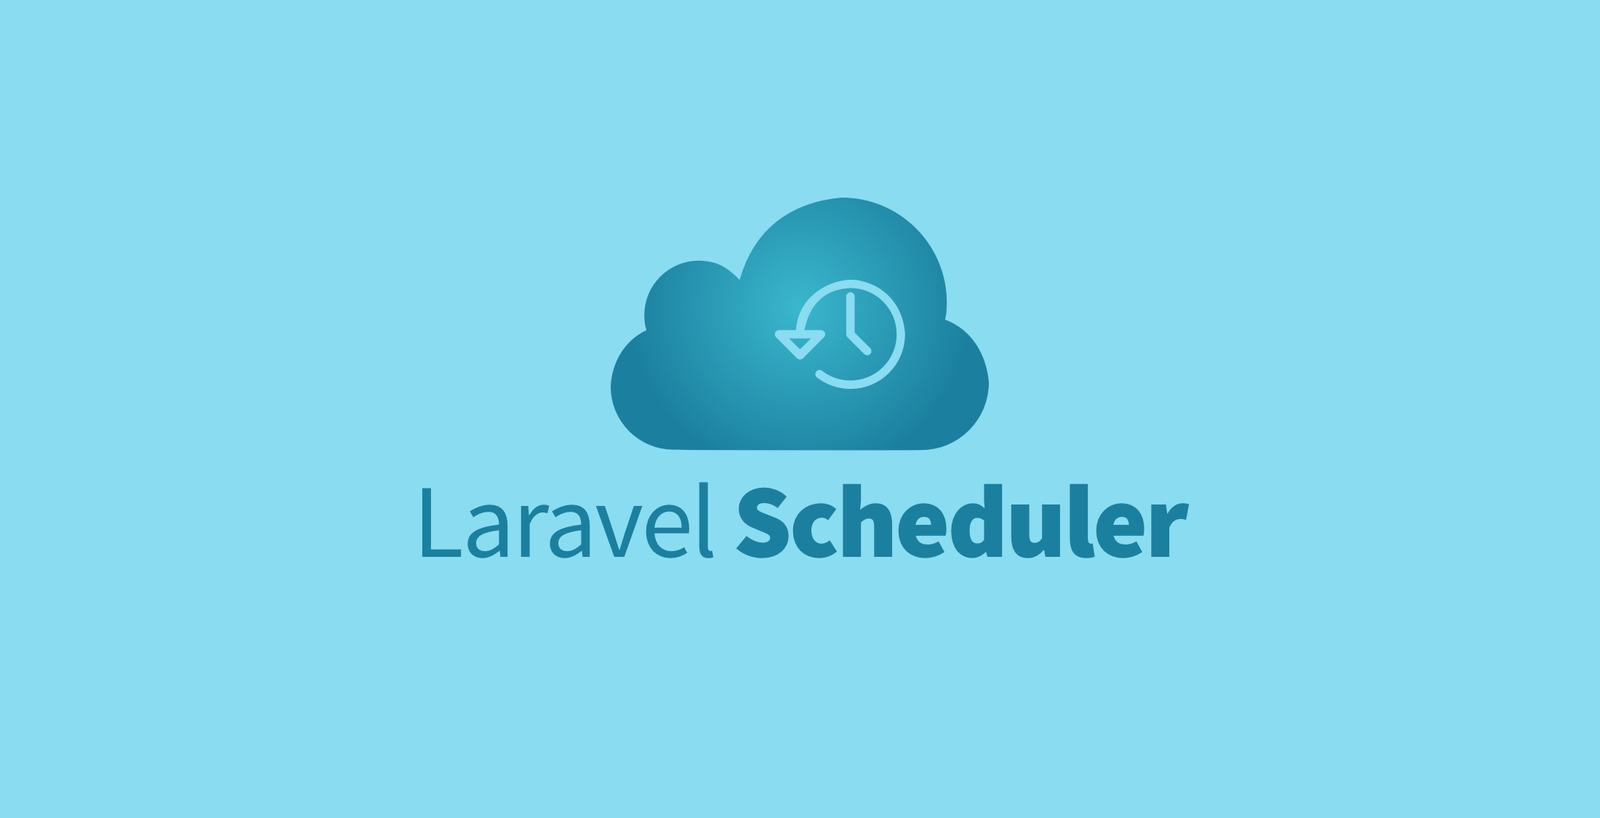 How to Schedule tasks with cron jobs using Laravel Scheduler